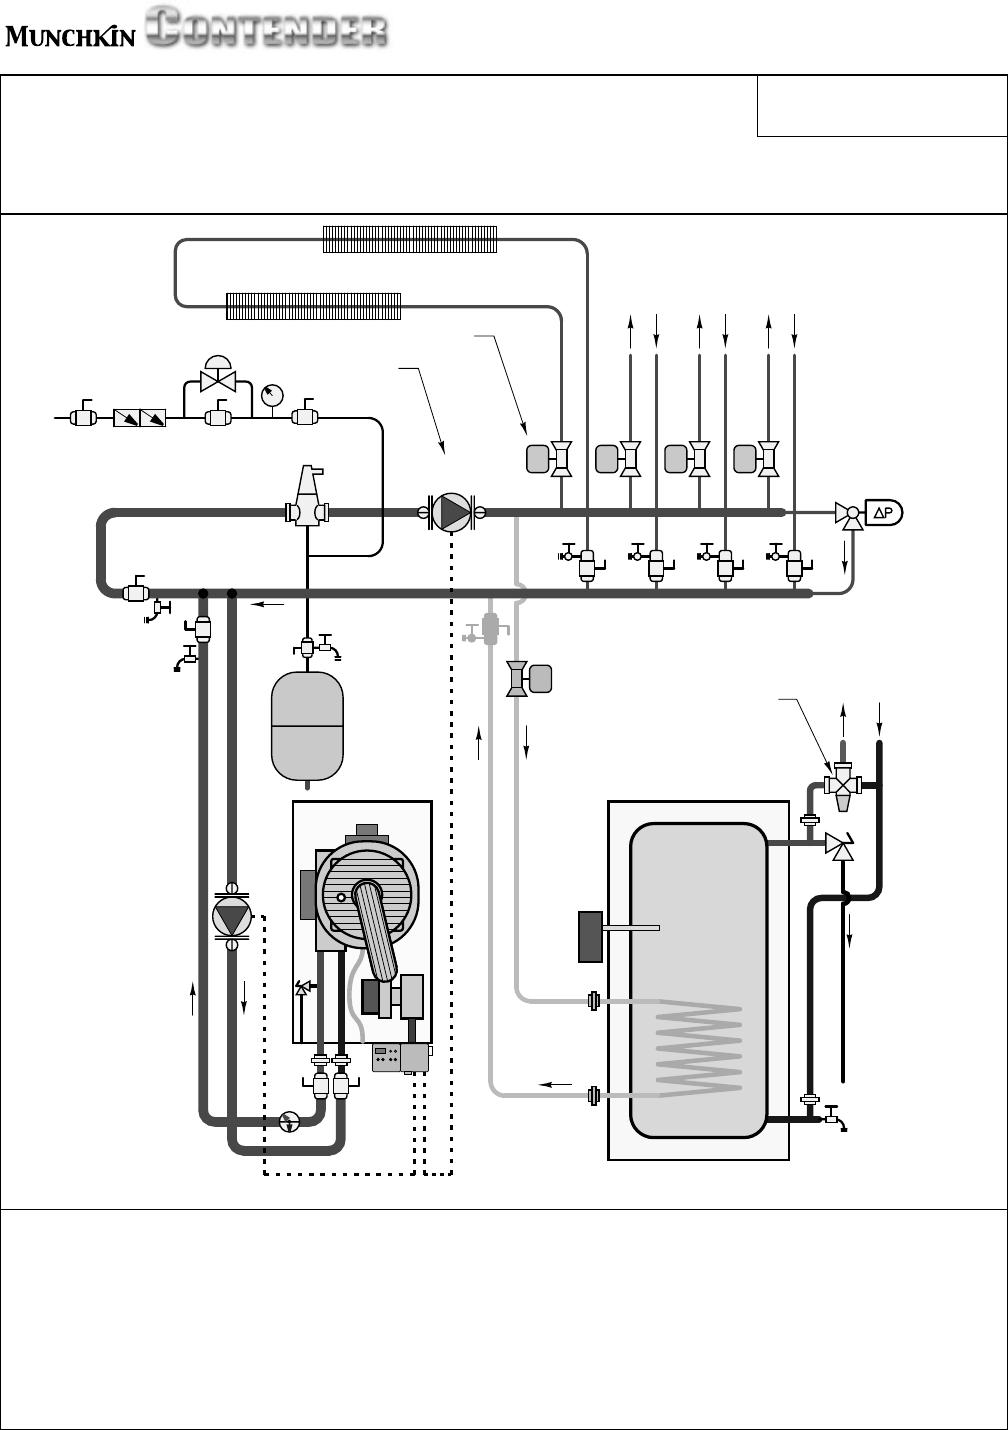 Munchkin Boiler Wiring Diagram 30 Images Auto